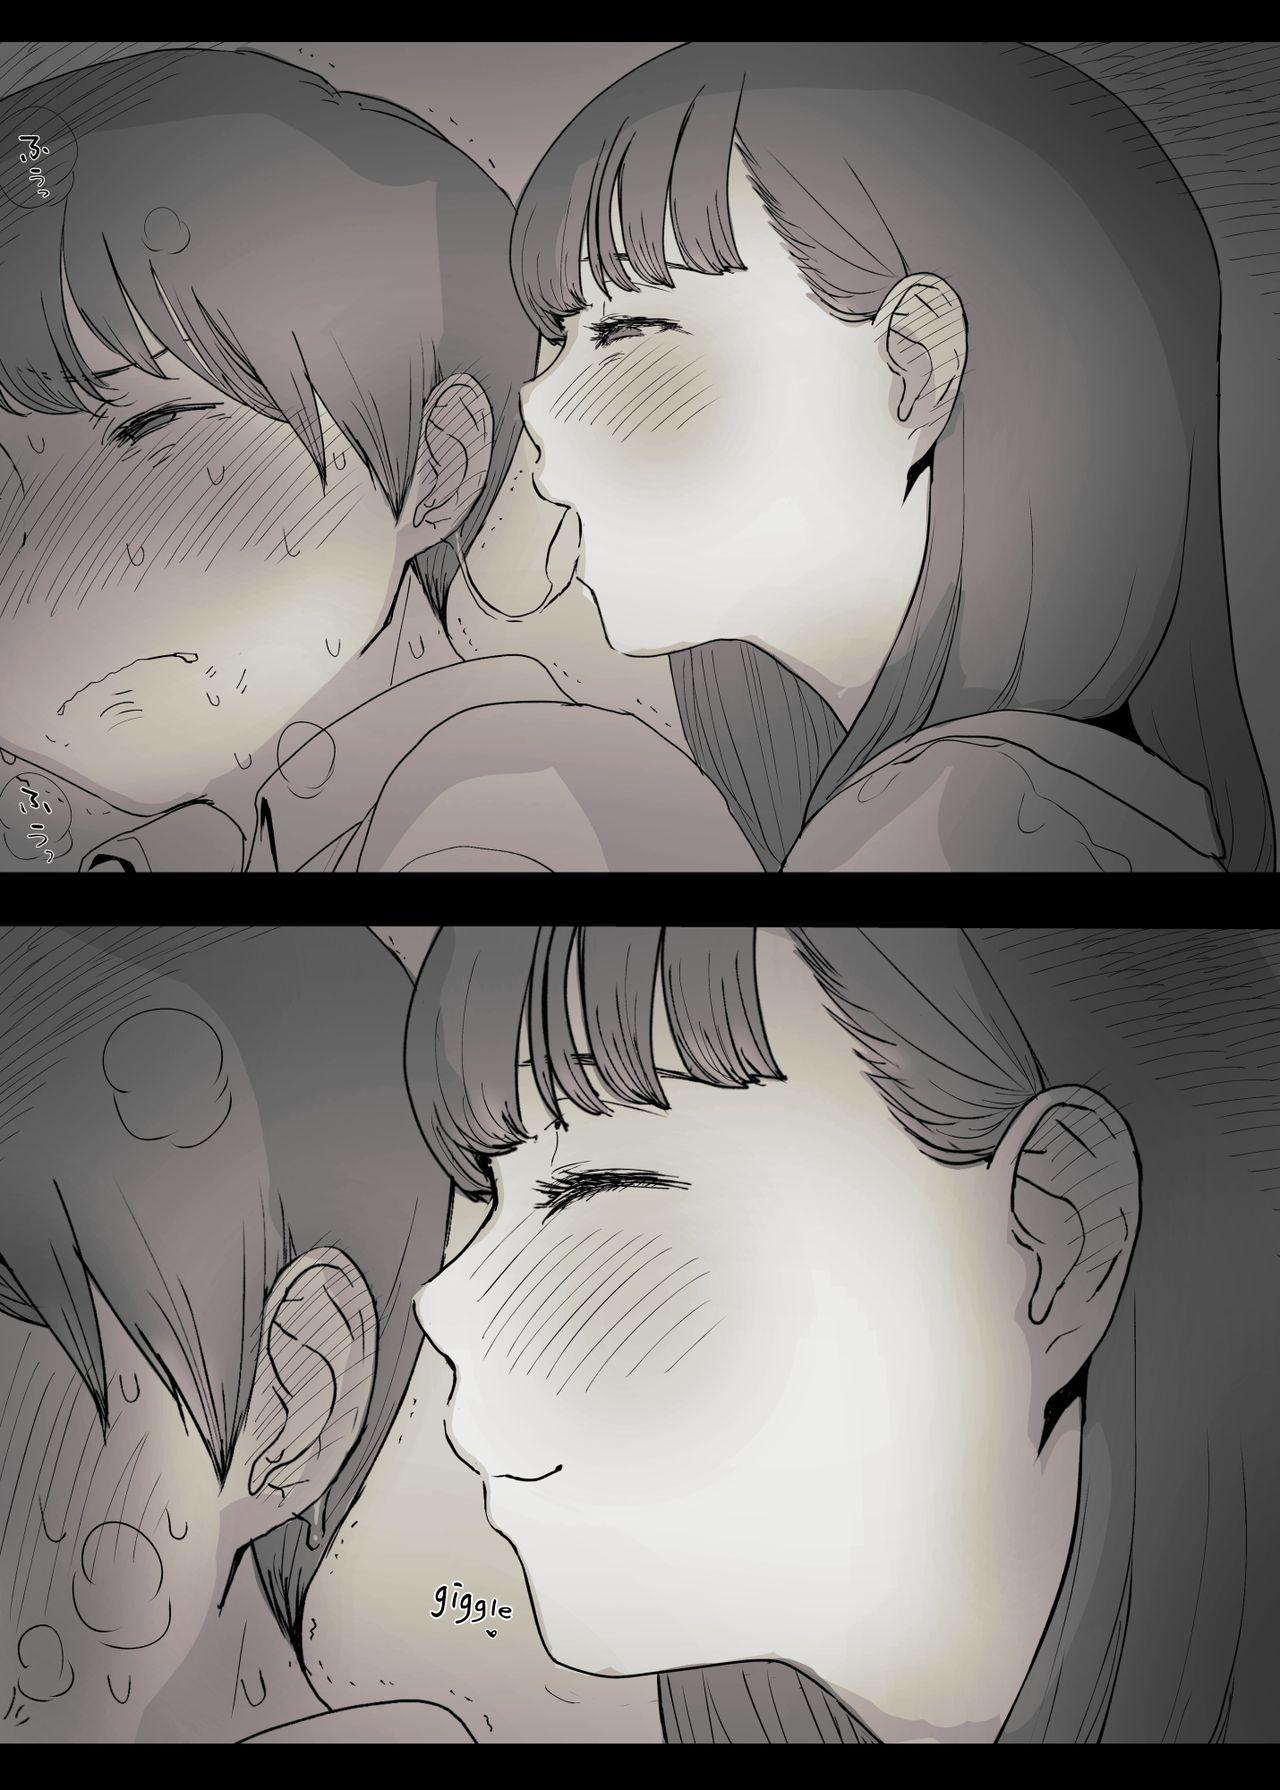 Bungaku Joshi ni Taberareru | Eaten Up by the Bookworm Girl 23